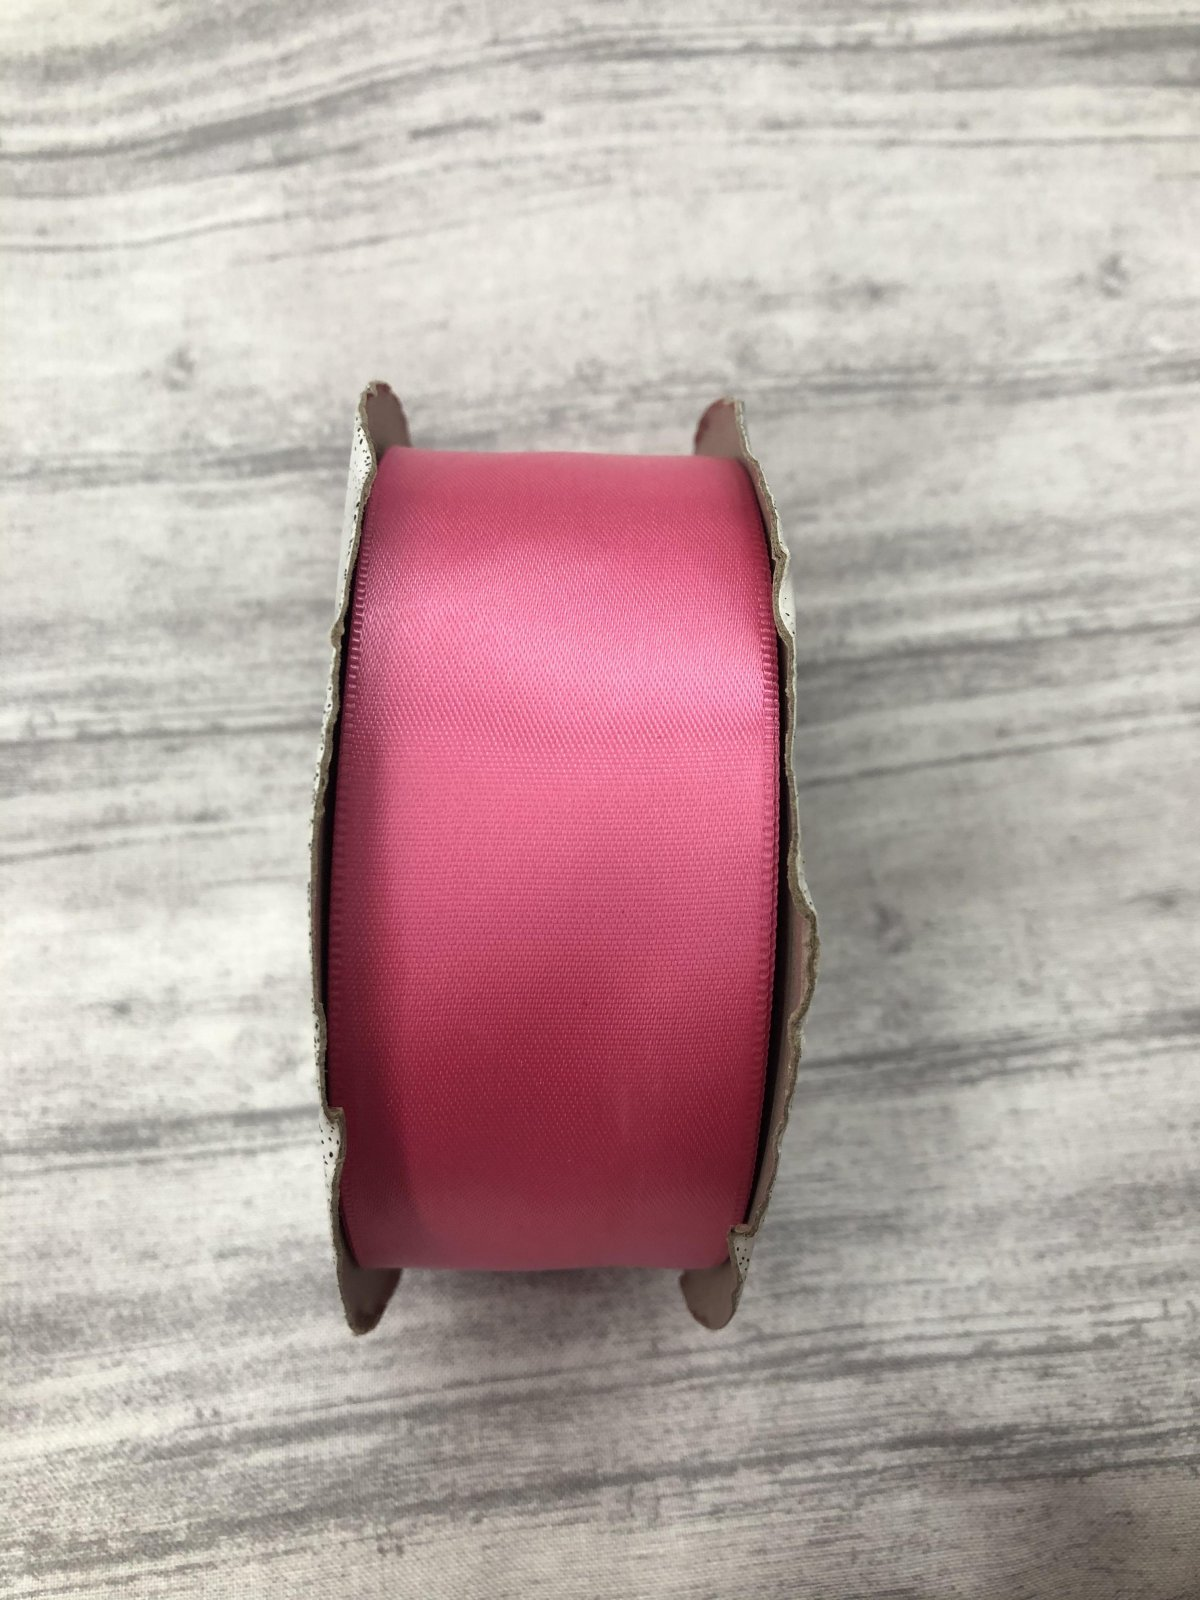 Supreme Lace Inc. Double Face Satin Bright Pink Ribbon 25M